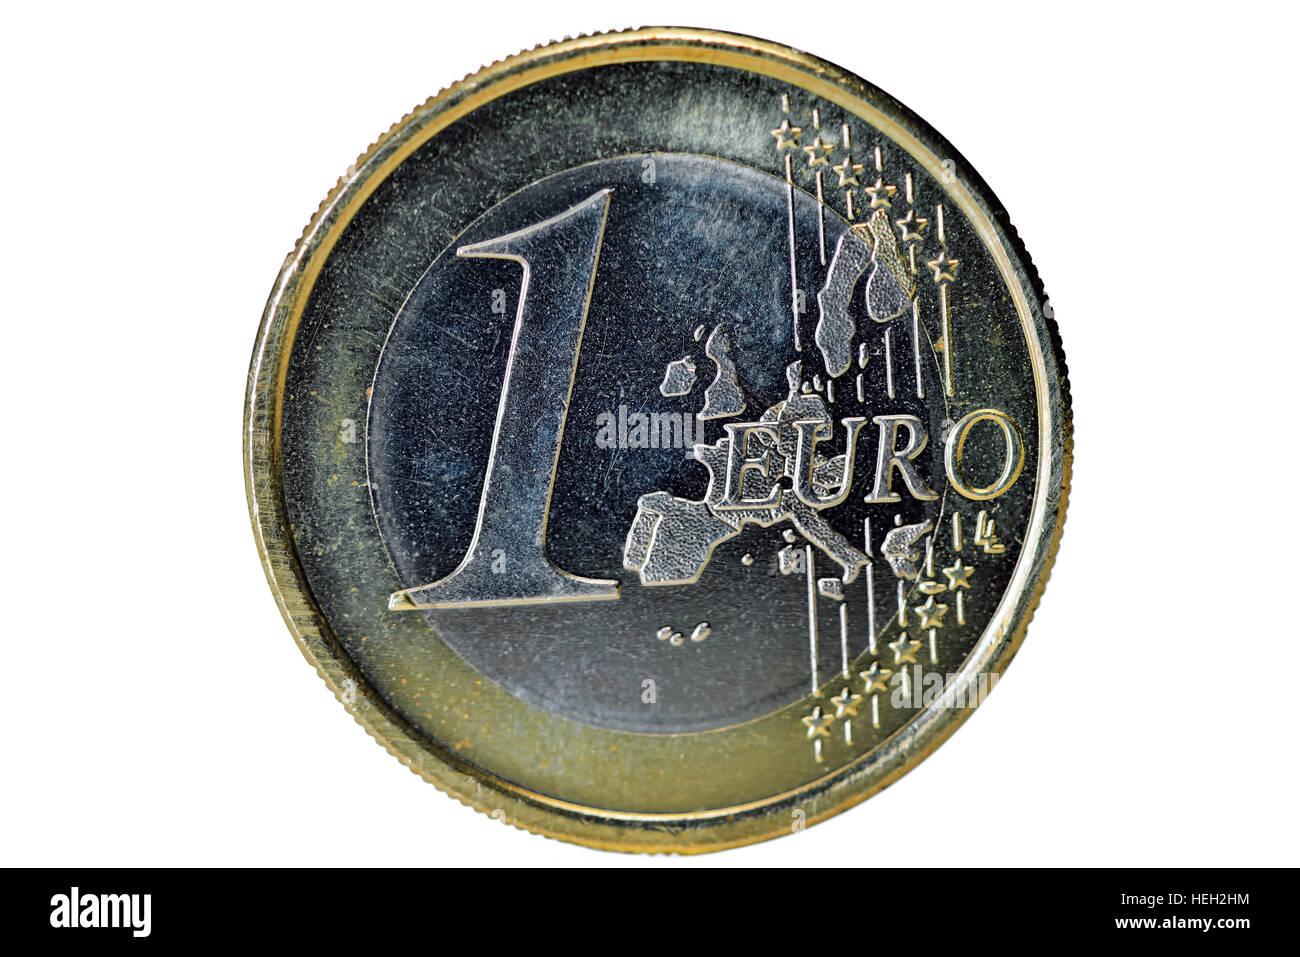 Ein-Euro-Muenze - Stock Image